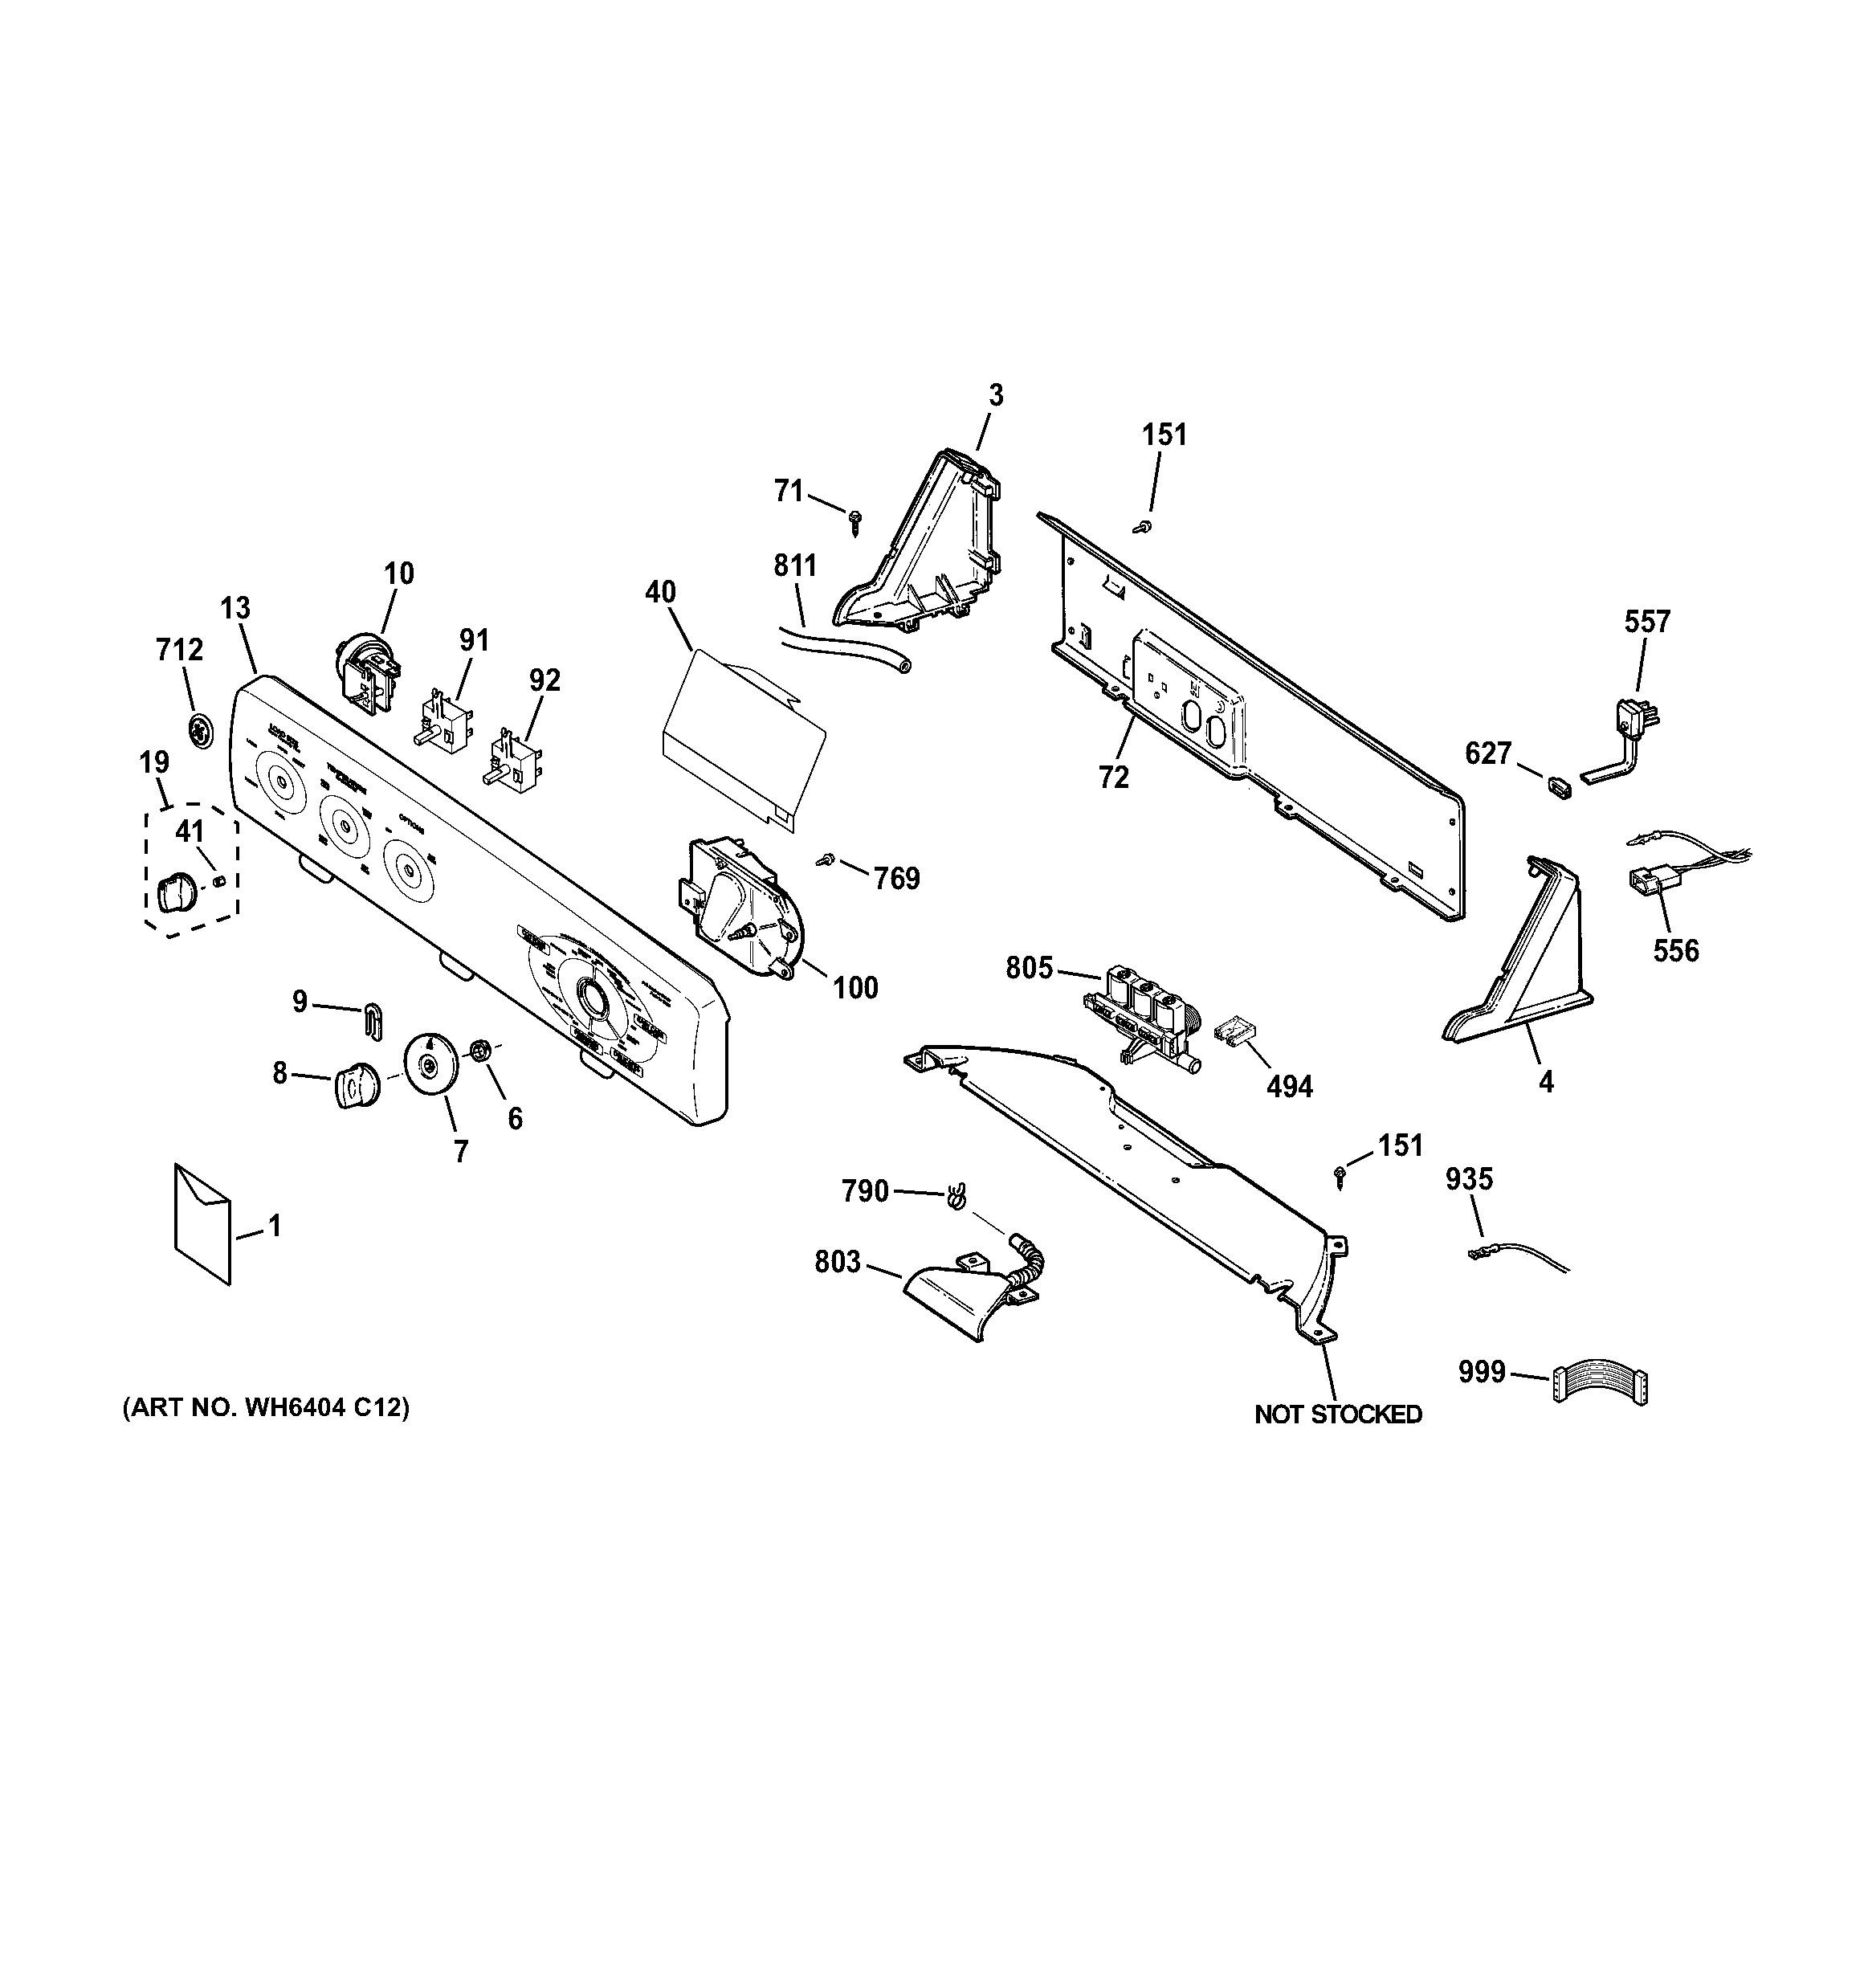 Steering Arm Diagram Ge Washer Parts Model Gban2800f0ww Of Steering Arm Diagram